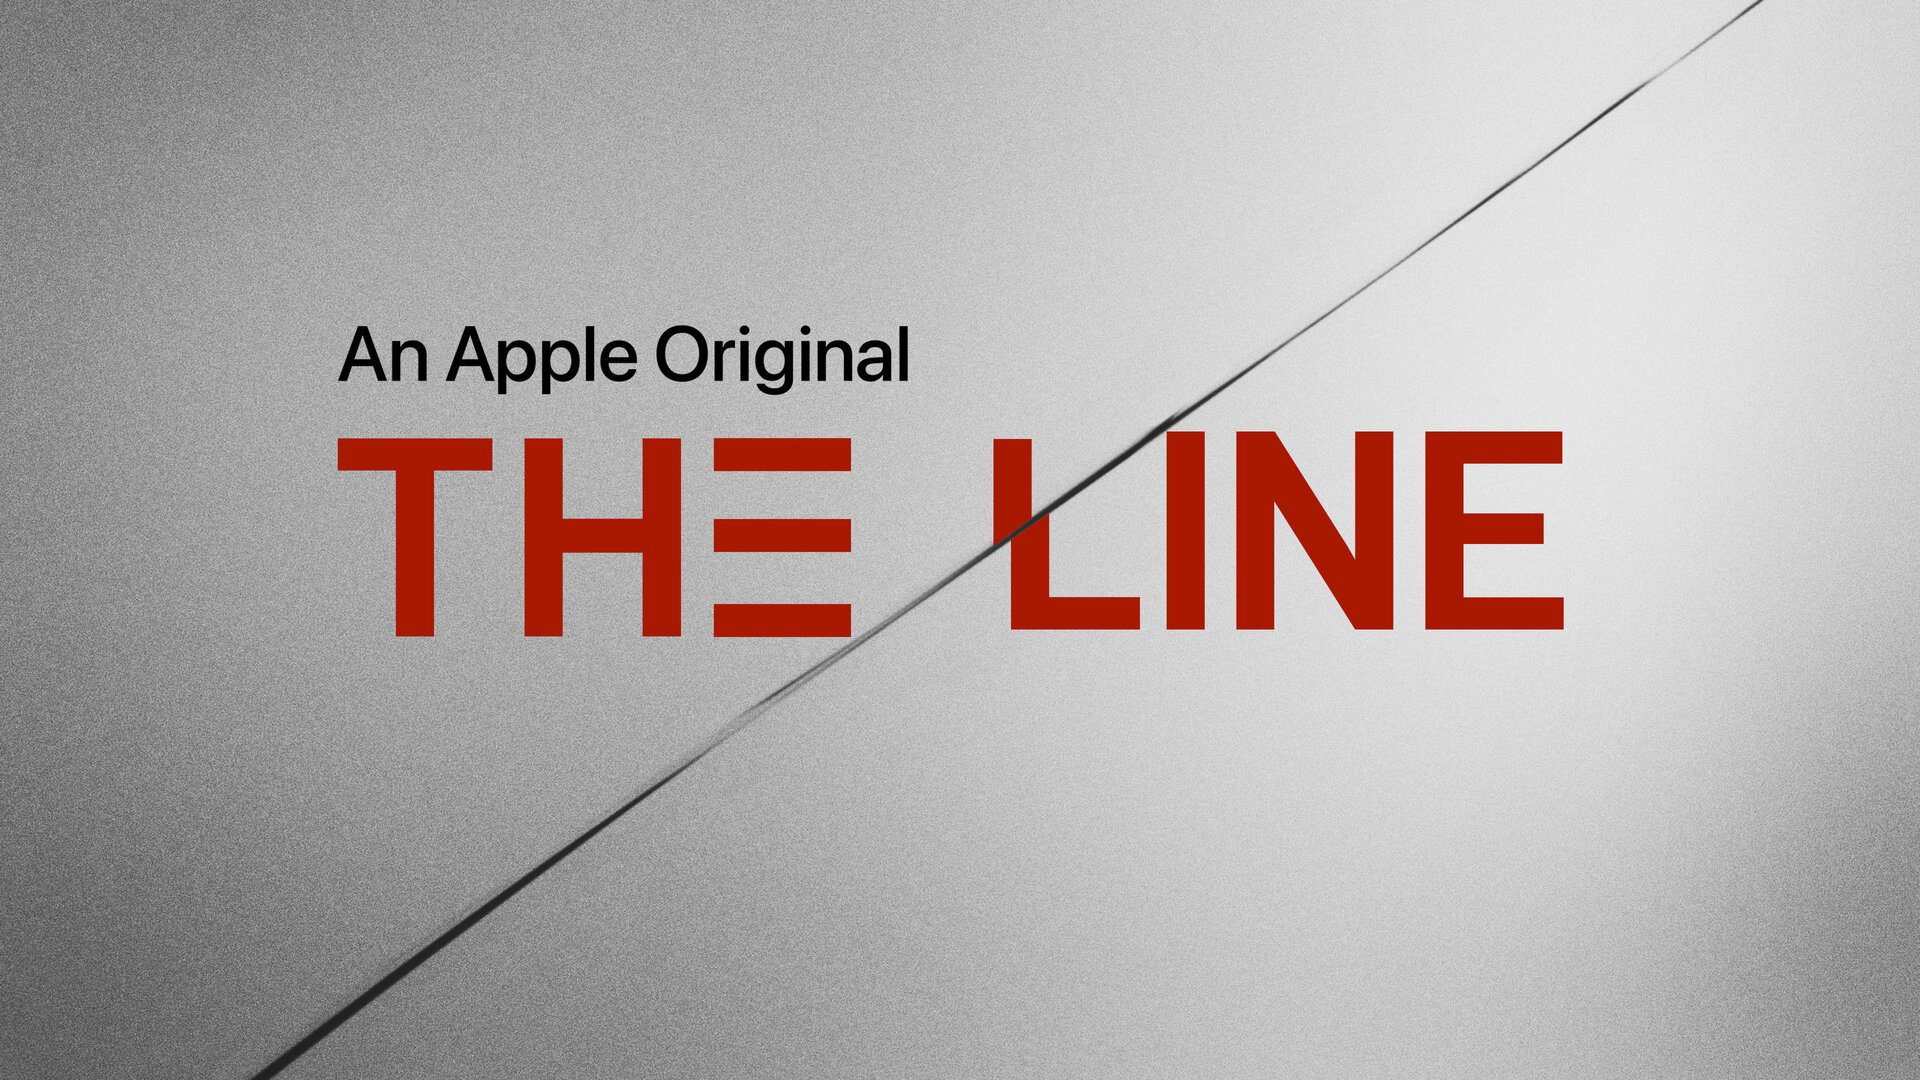 Review: Apple's original podcast 'The Line' is a storytelling tour de force